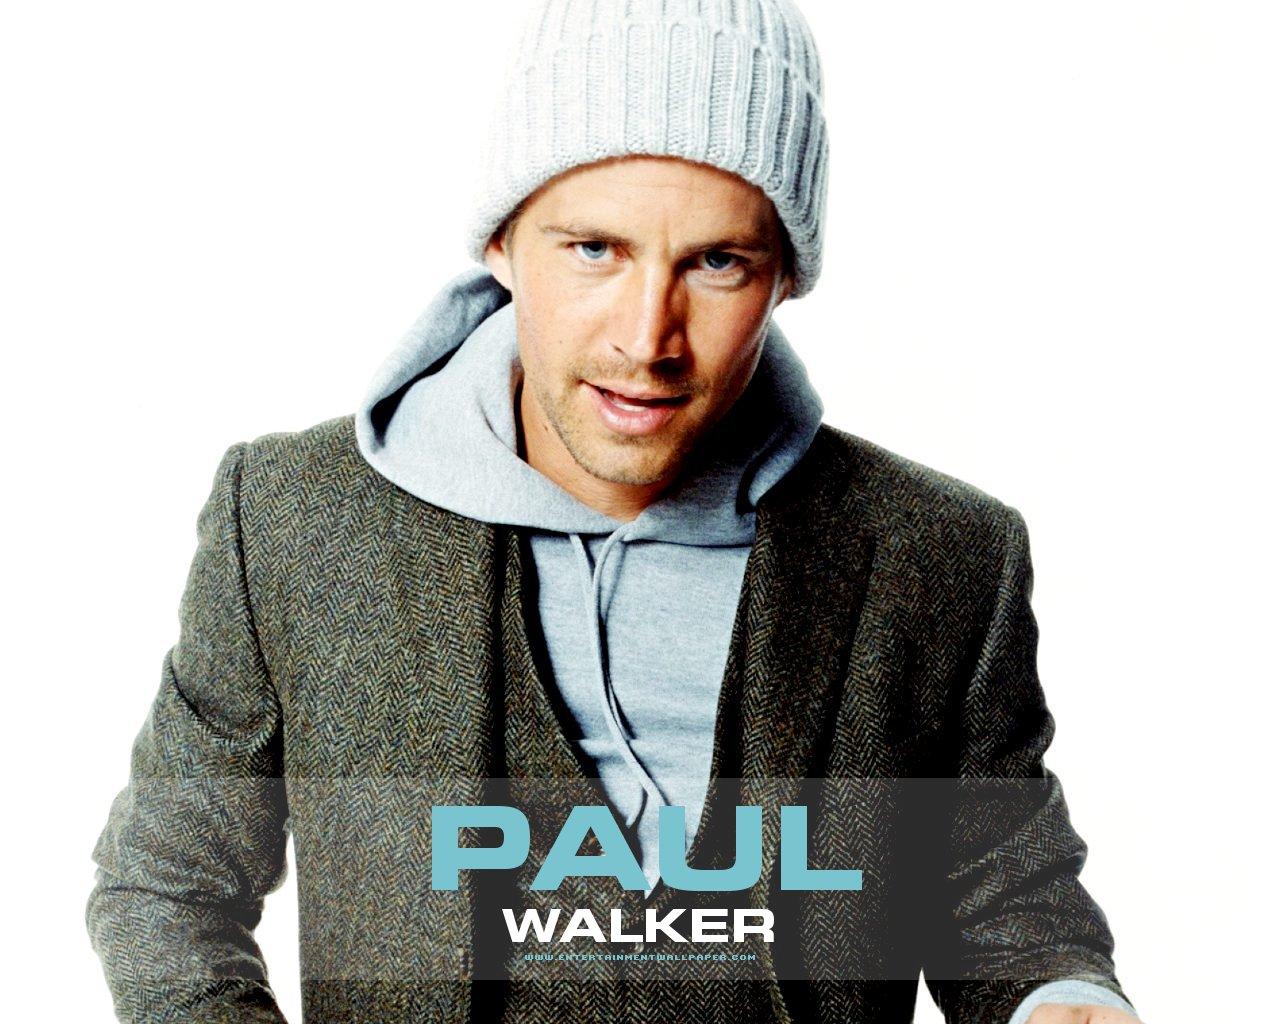 http://2.bp.blogspot.com/-NT9dYME6vZ8/TvICOb4iHeI/AAAAAAAABzA/D7WQyuA1PxQ/s1600/Paul-Walker--paul-walker-646819_1280_1024.jpg